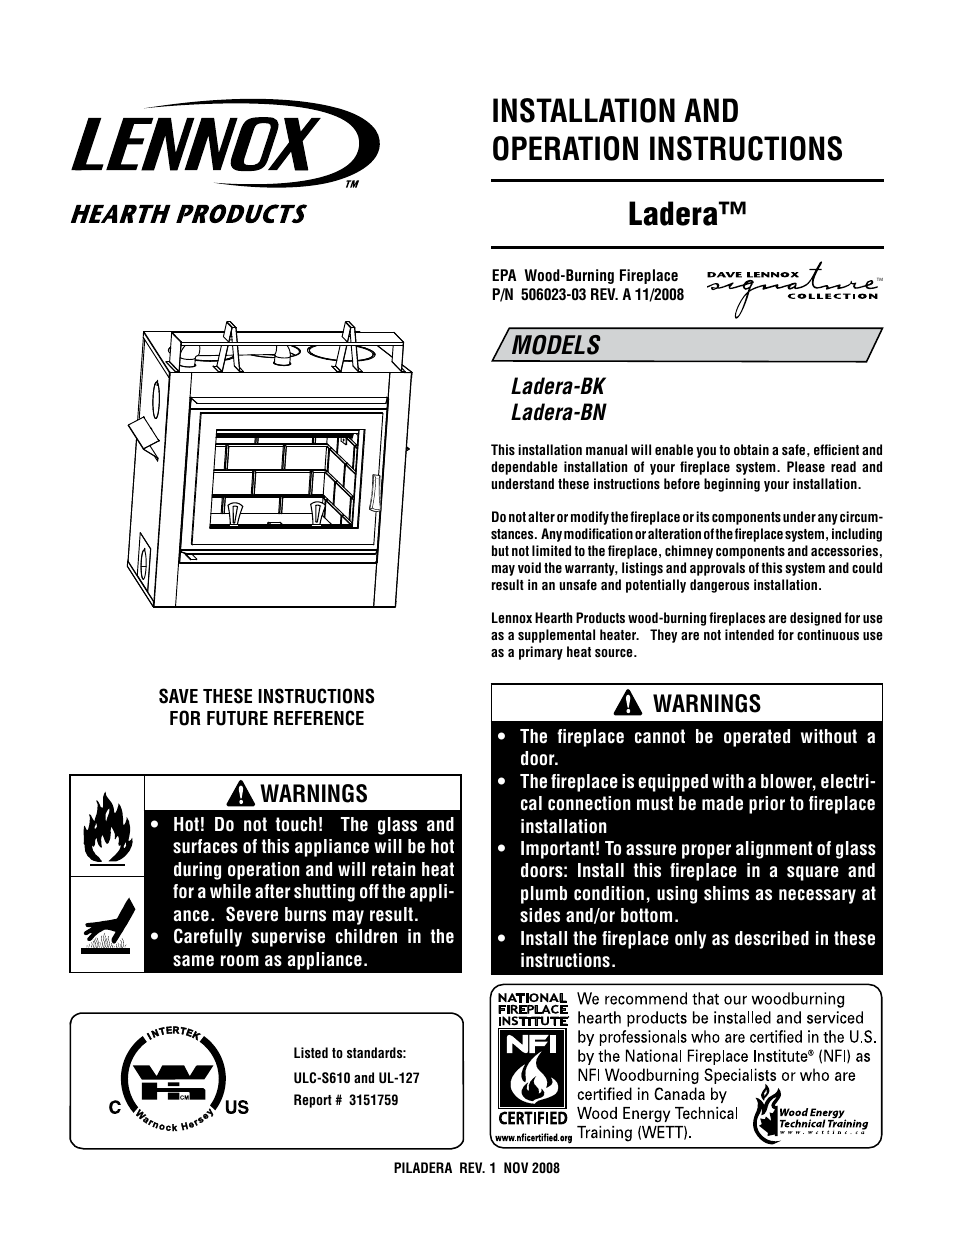 Lennox Hearth Ladera BK User Manual